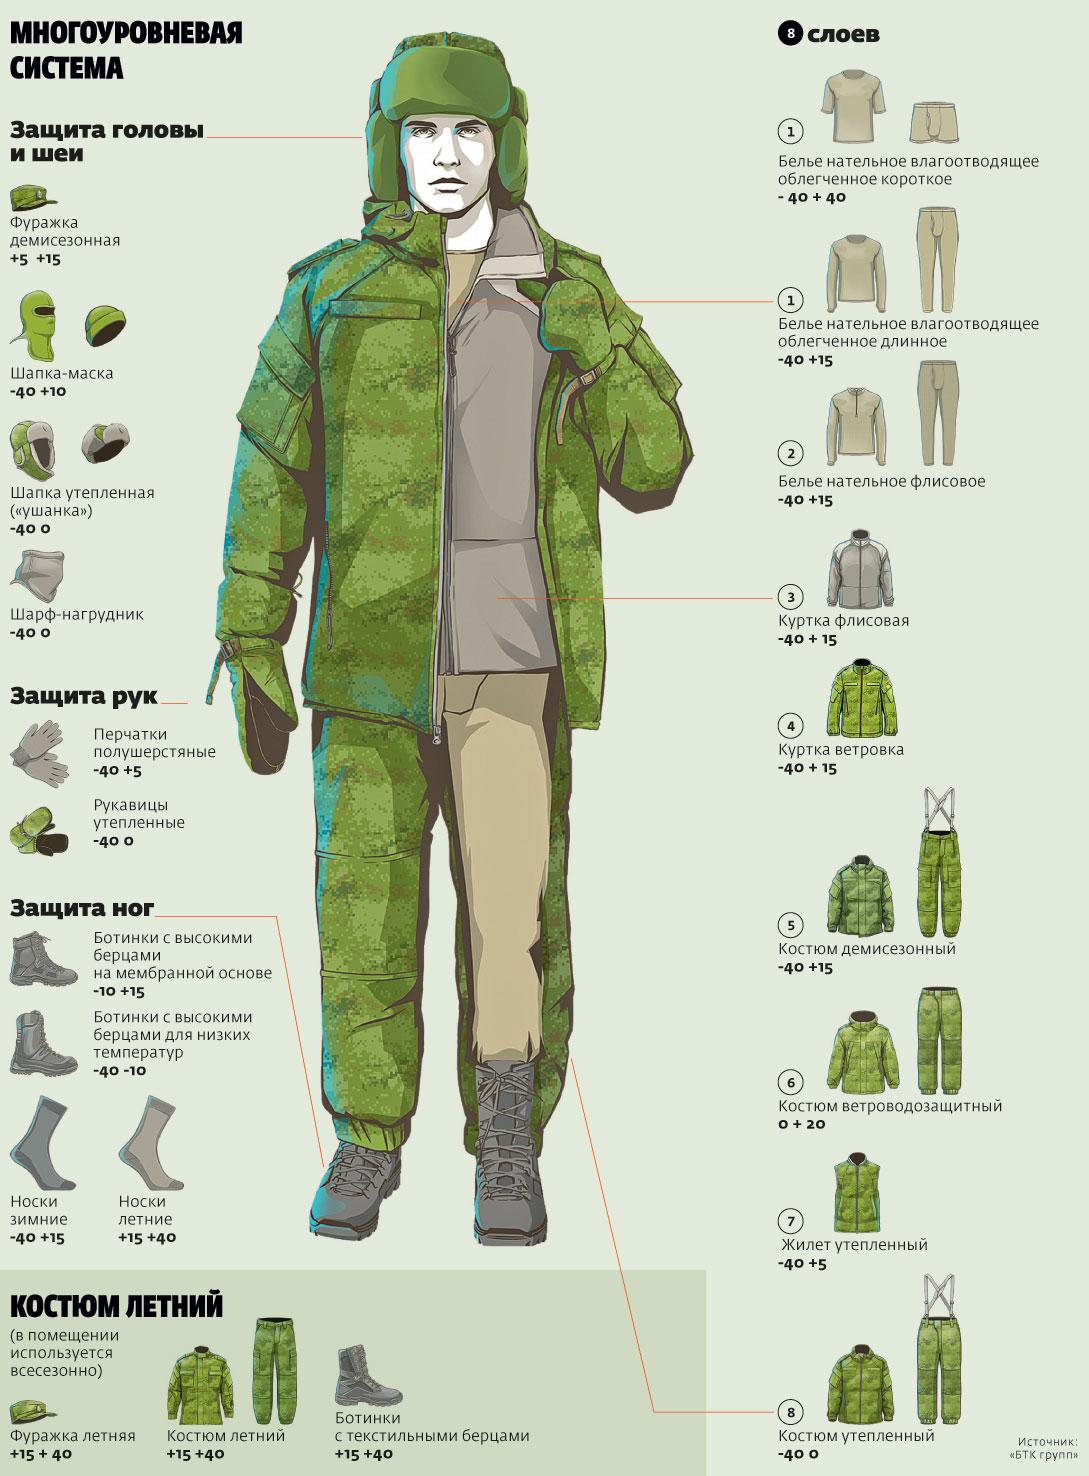 Инфографика ВКБО